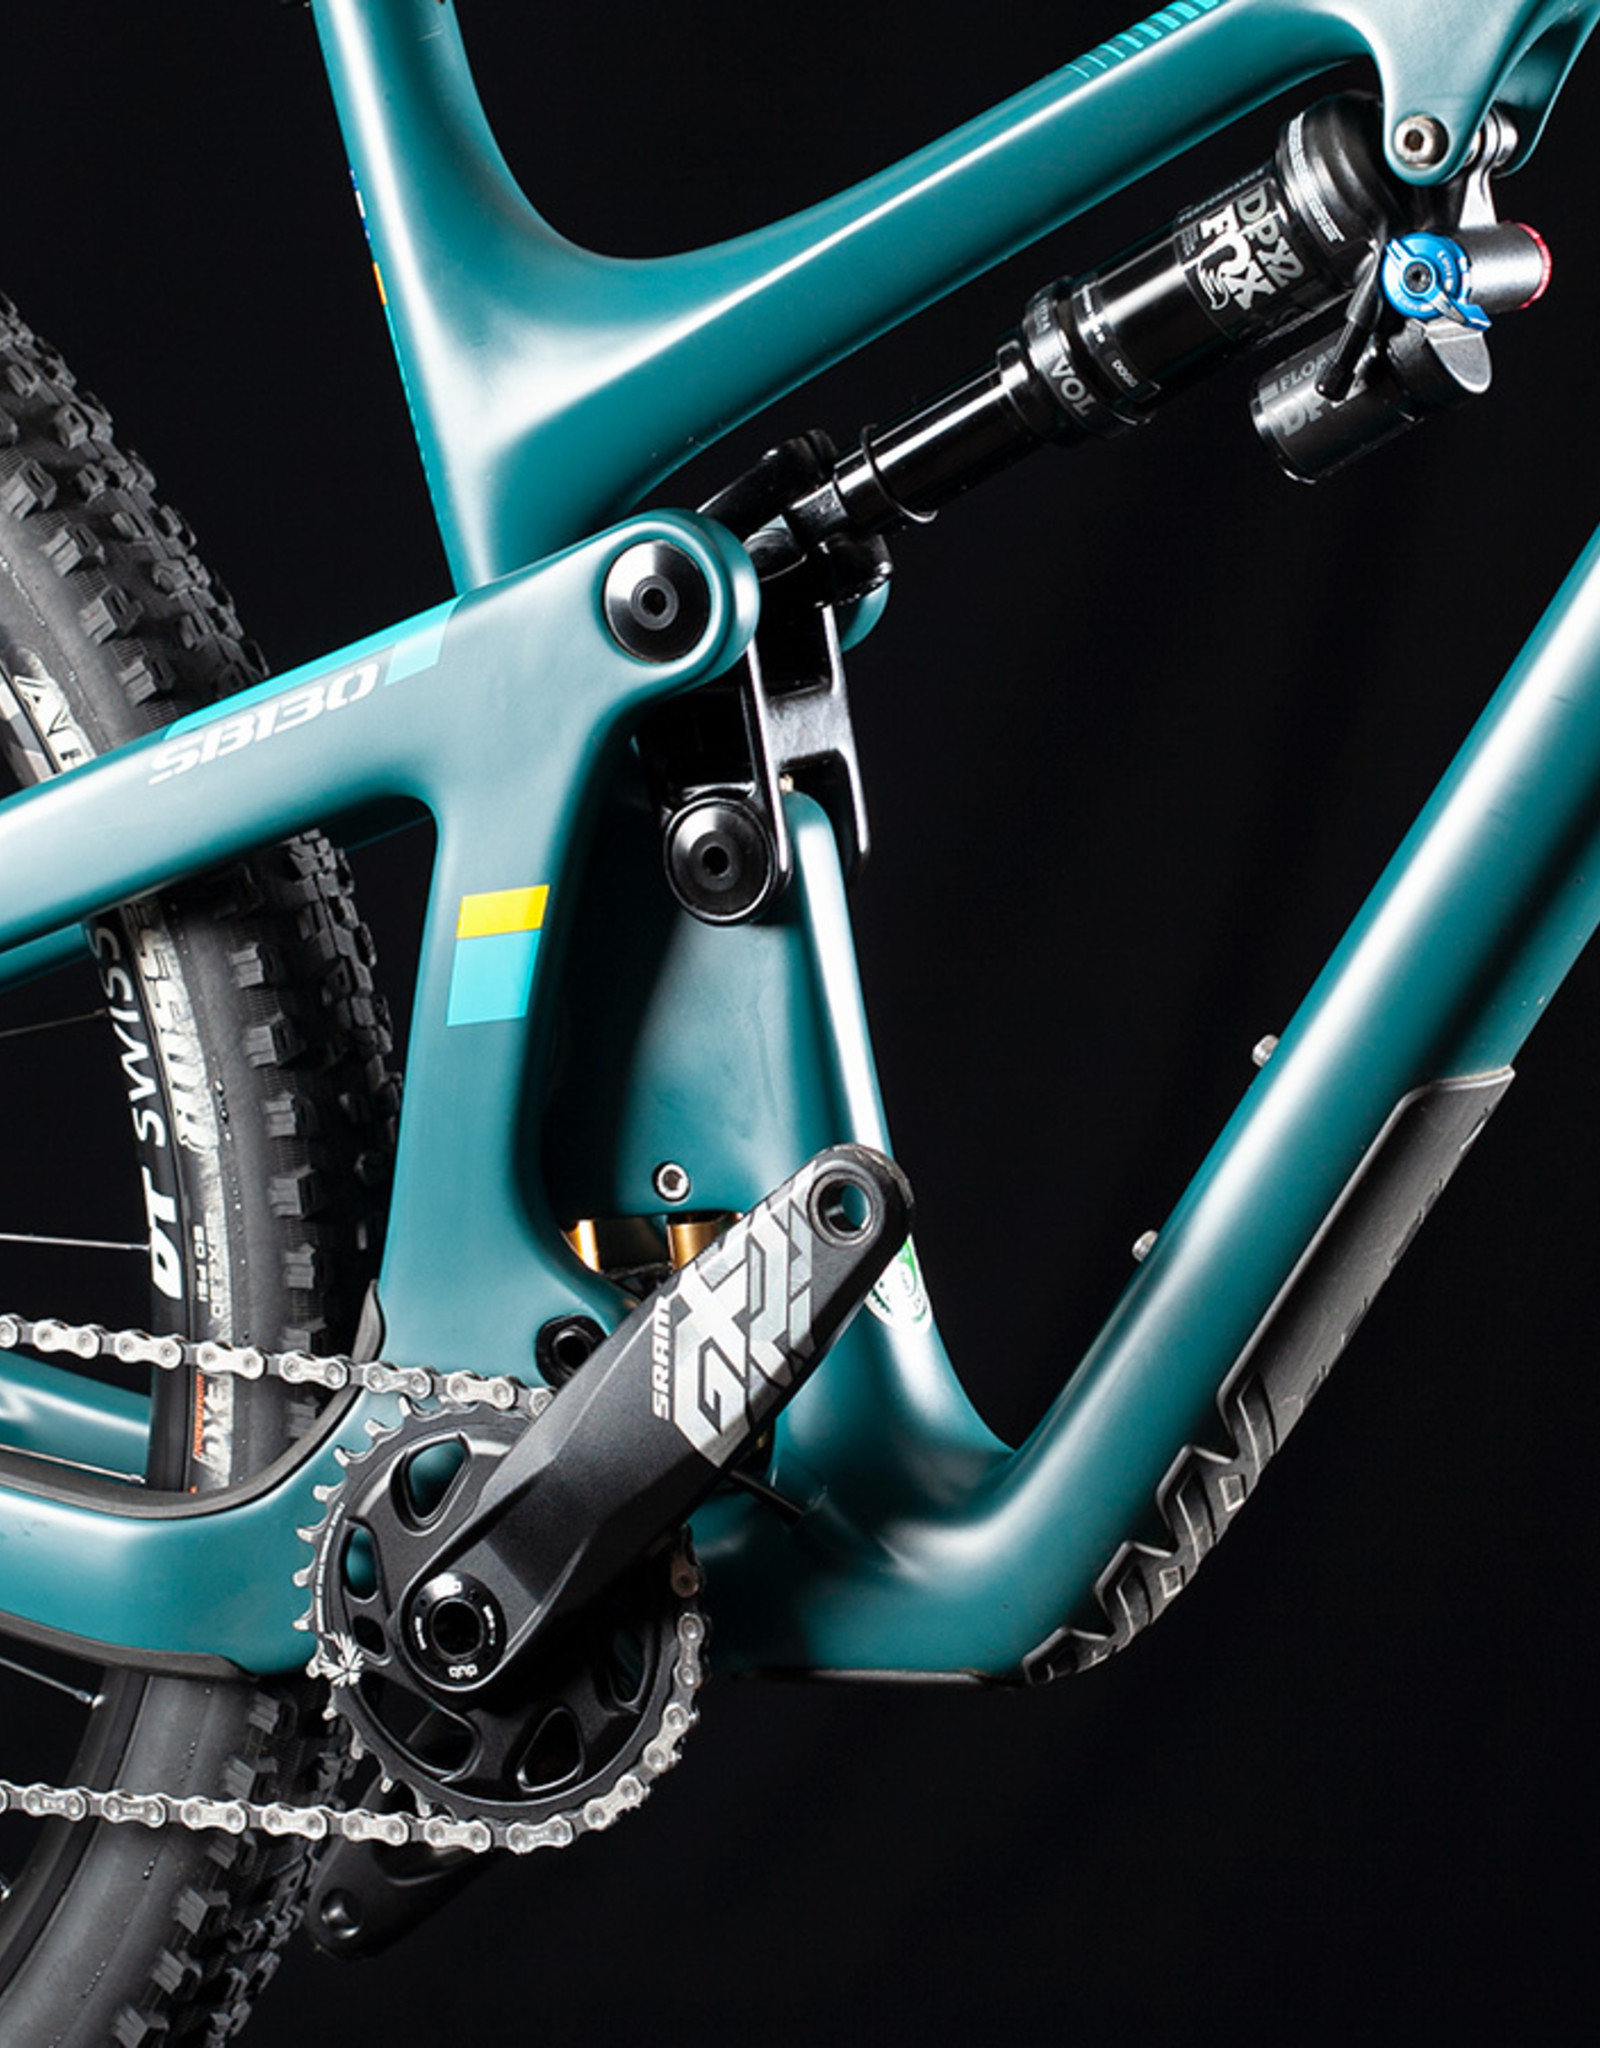 2019 Yeti SB 130 GX Eagle Carbon mountain Bike 29er Size Large, Sweet Bike!